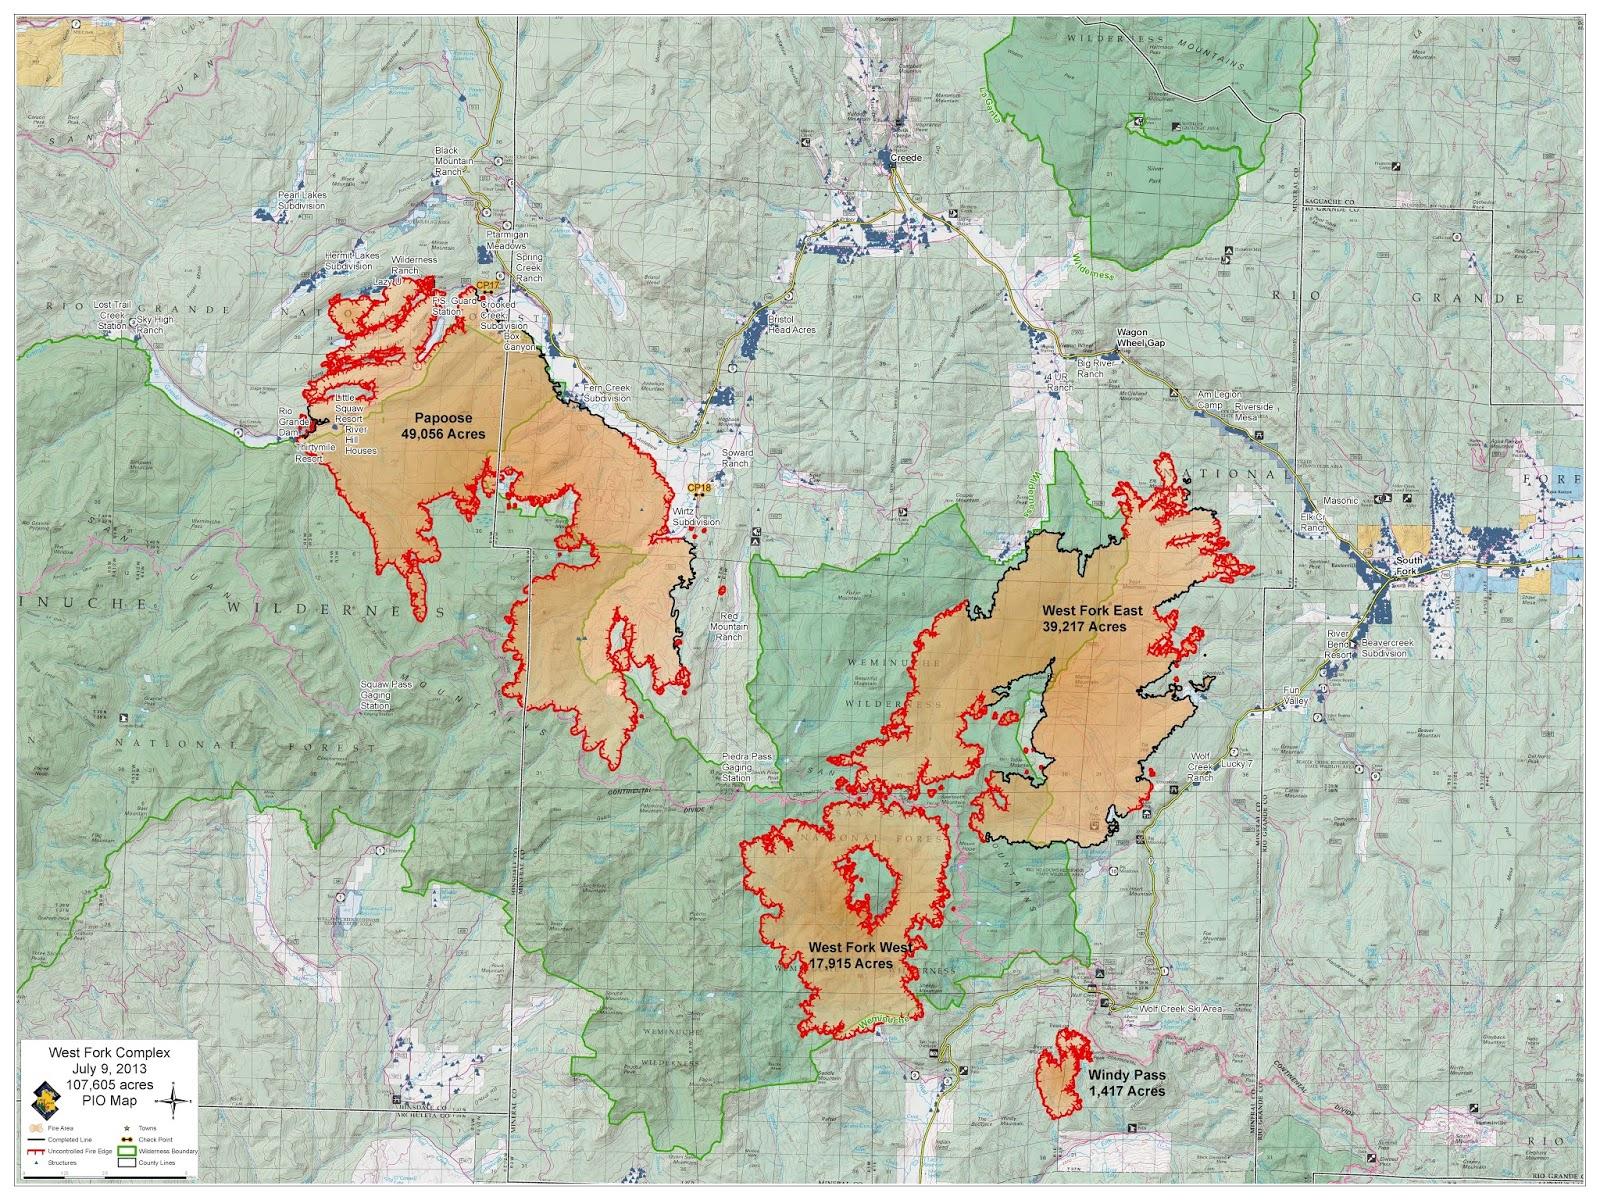 West Fork Fire Complex: Fire Maps